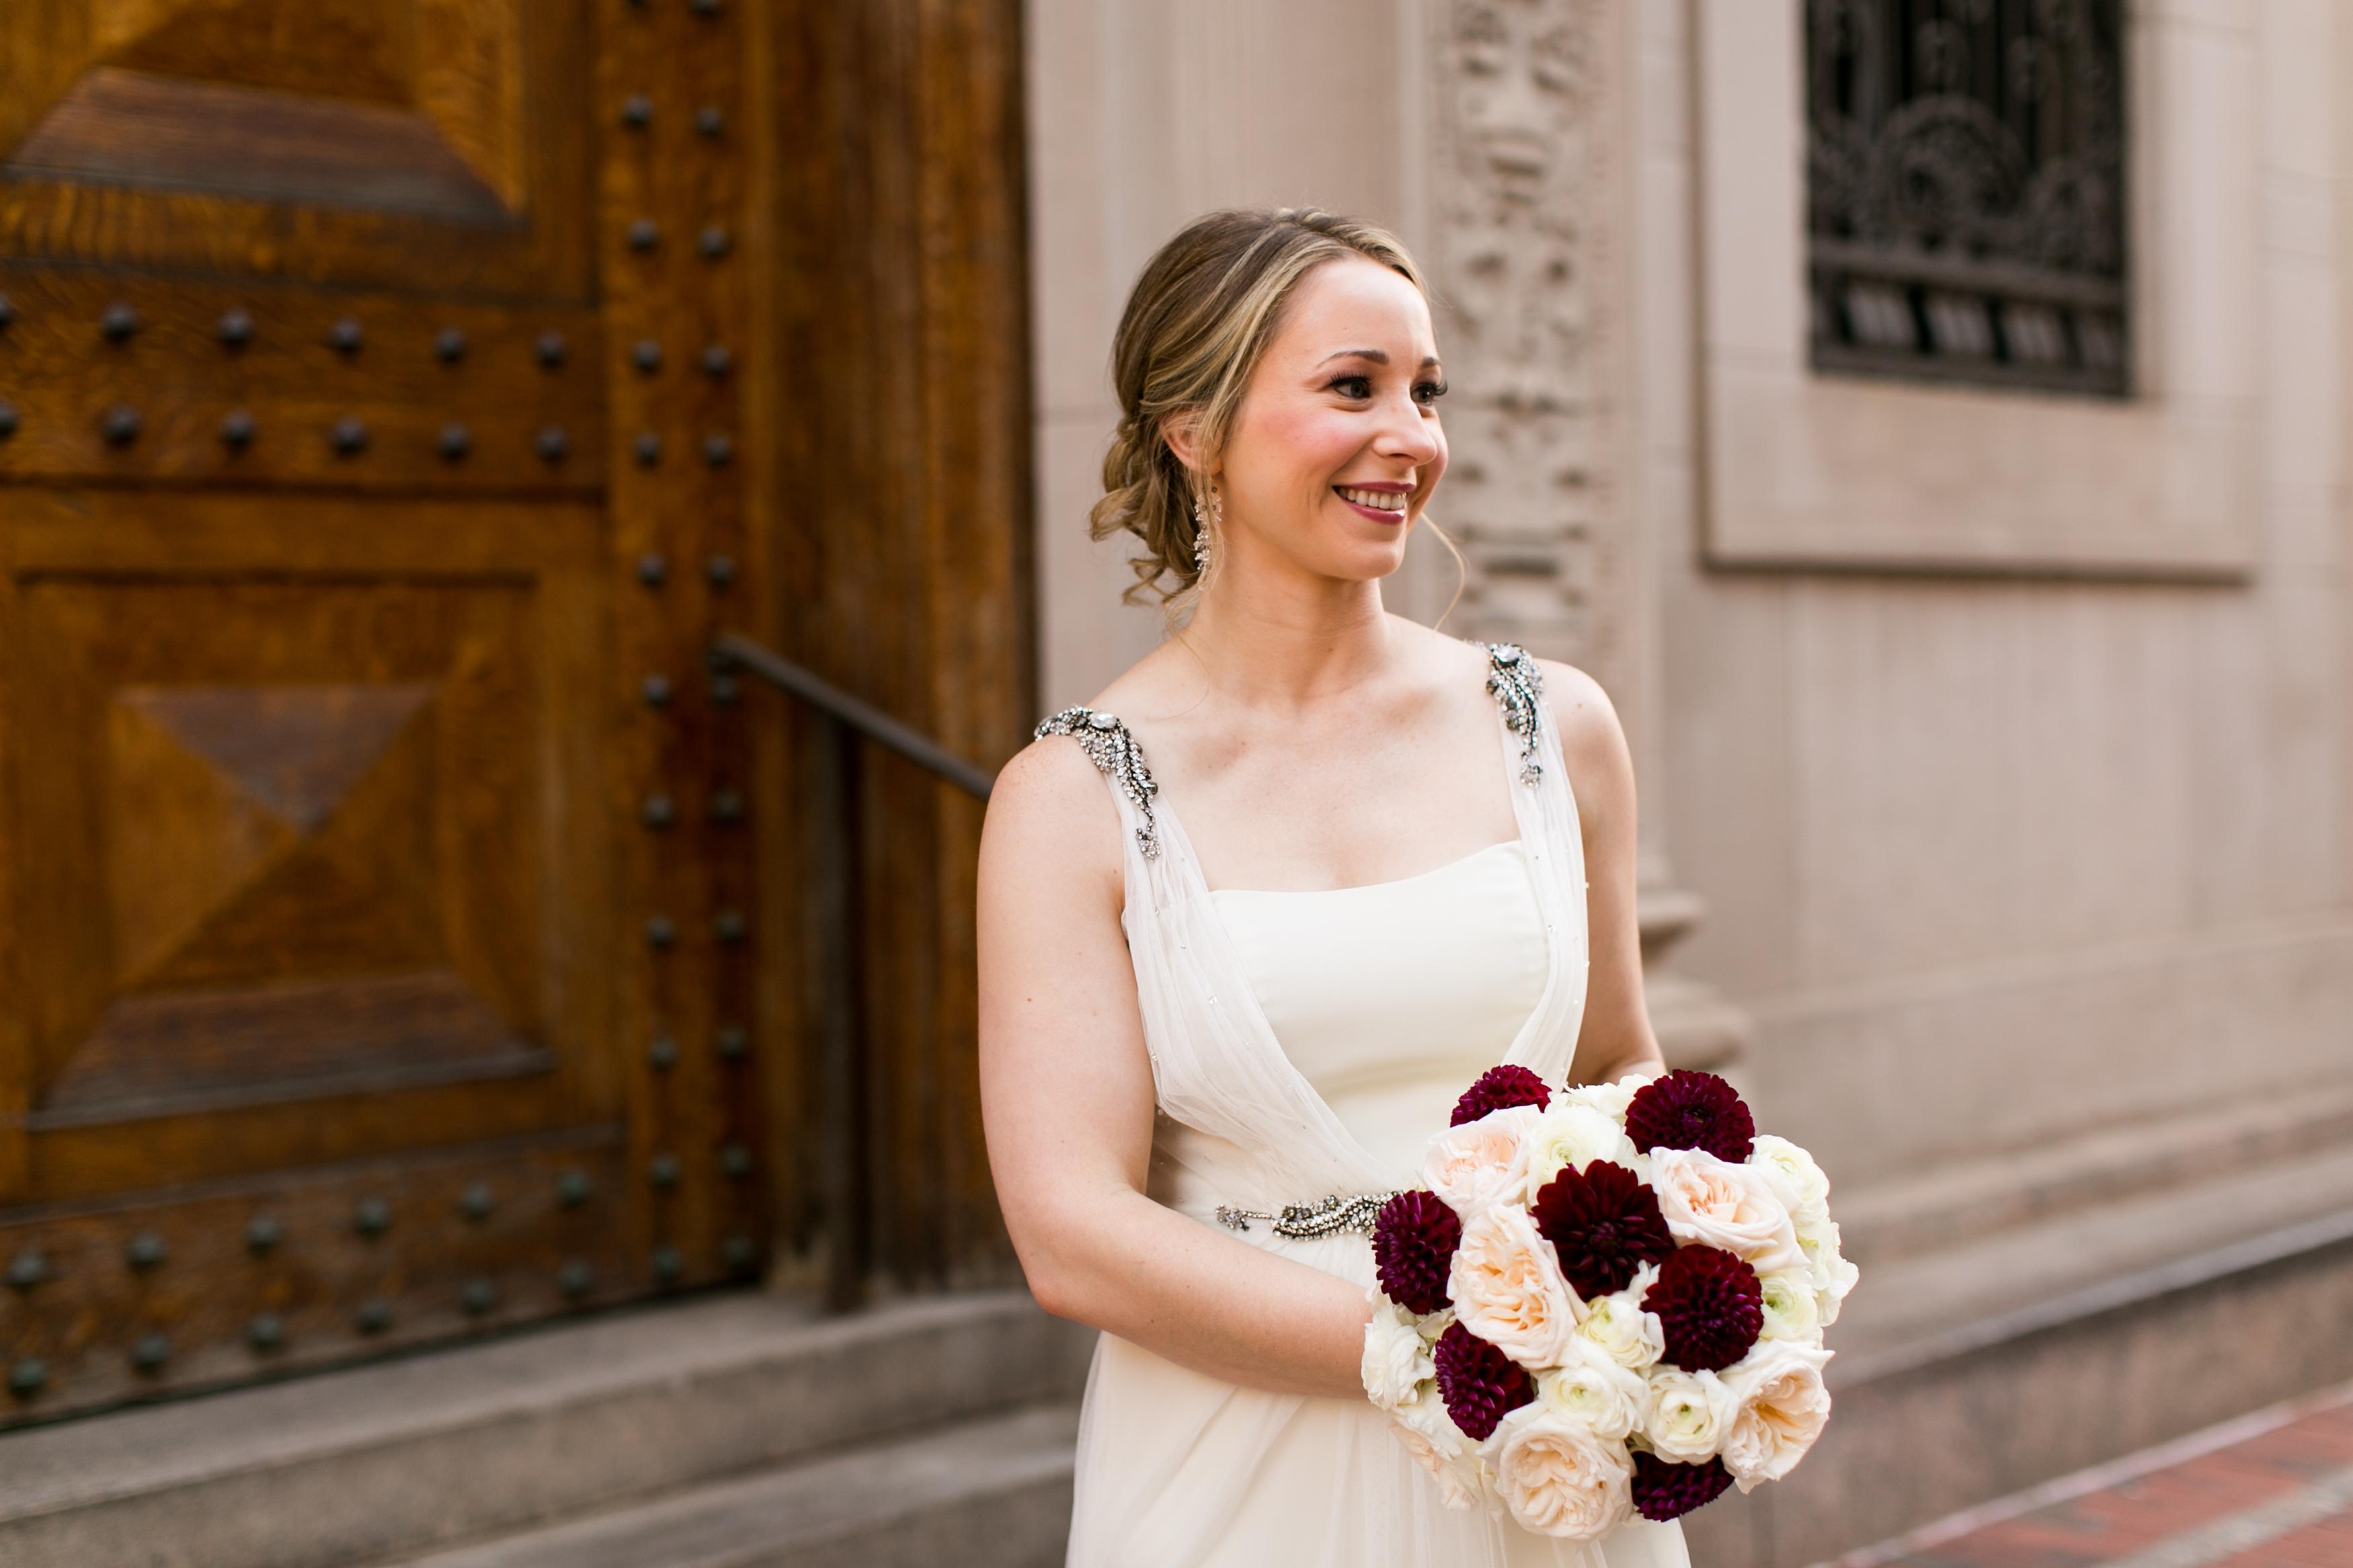 allegra_anderson_photography_society_room_hartford_wedding_photographer_vesci_33